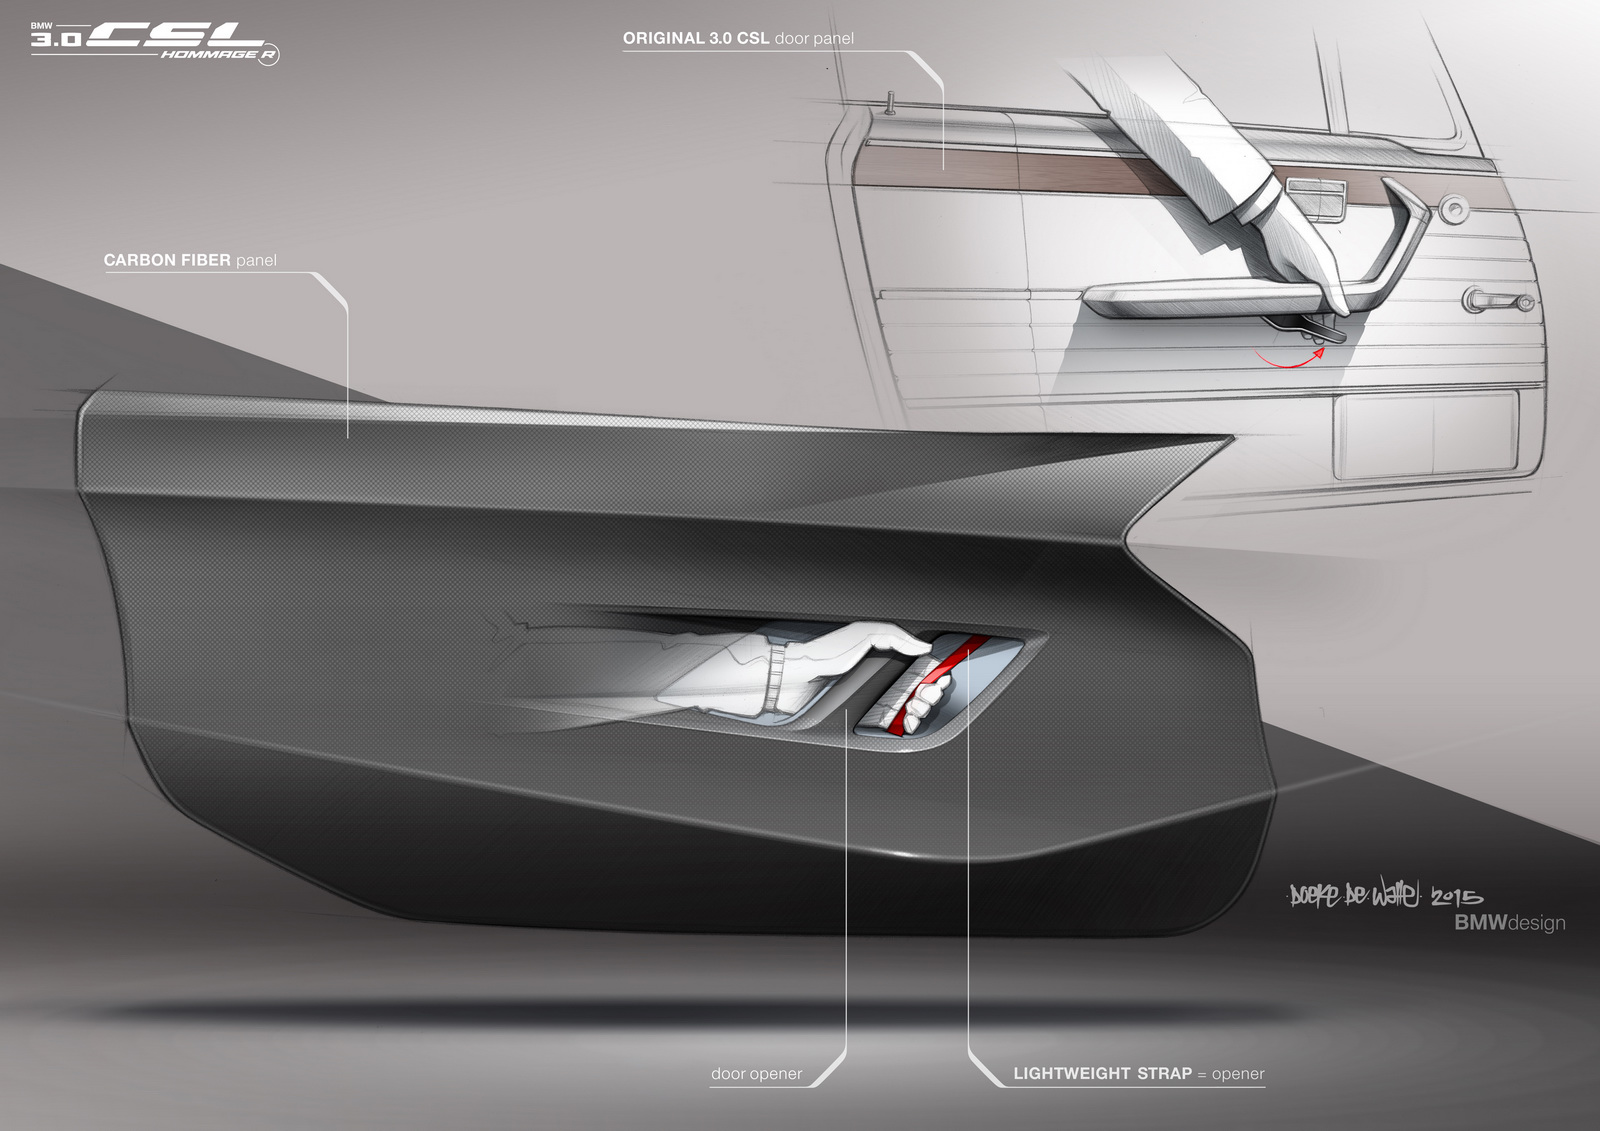 BMW-30-Hommage-R-Concept-44